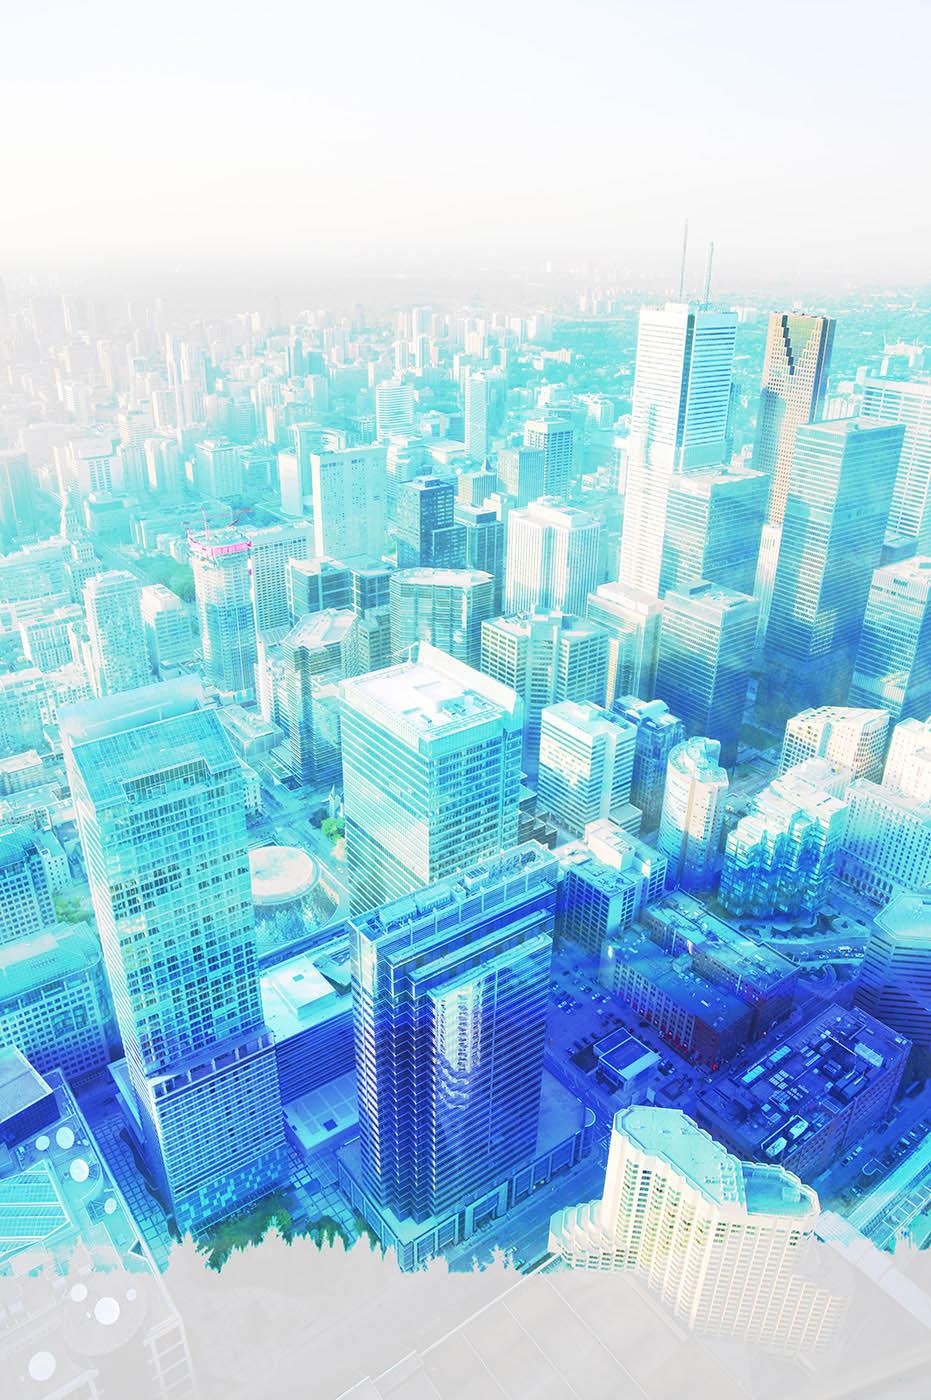 Urban Vertical Cityscape Stock Photo